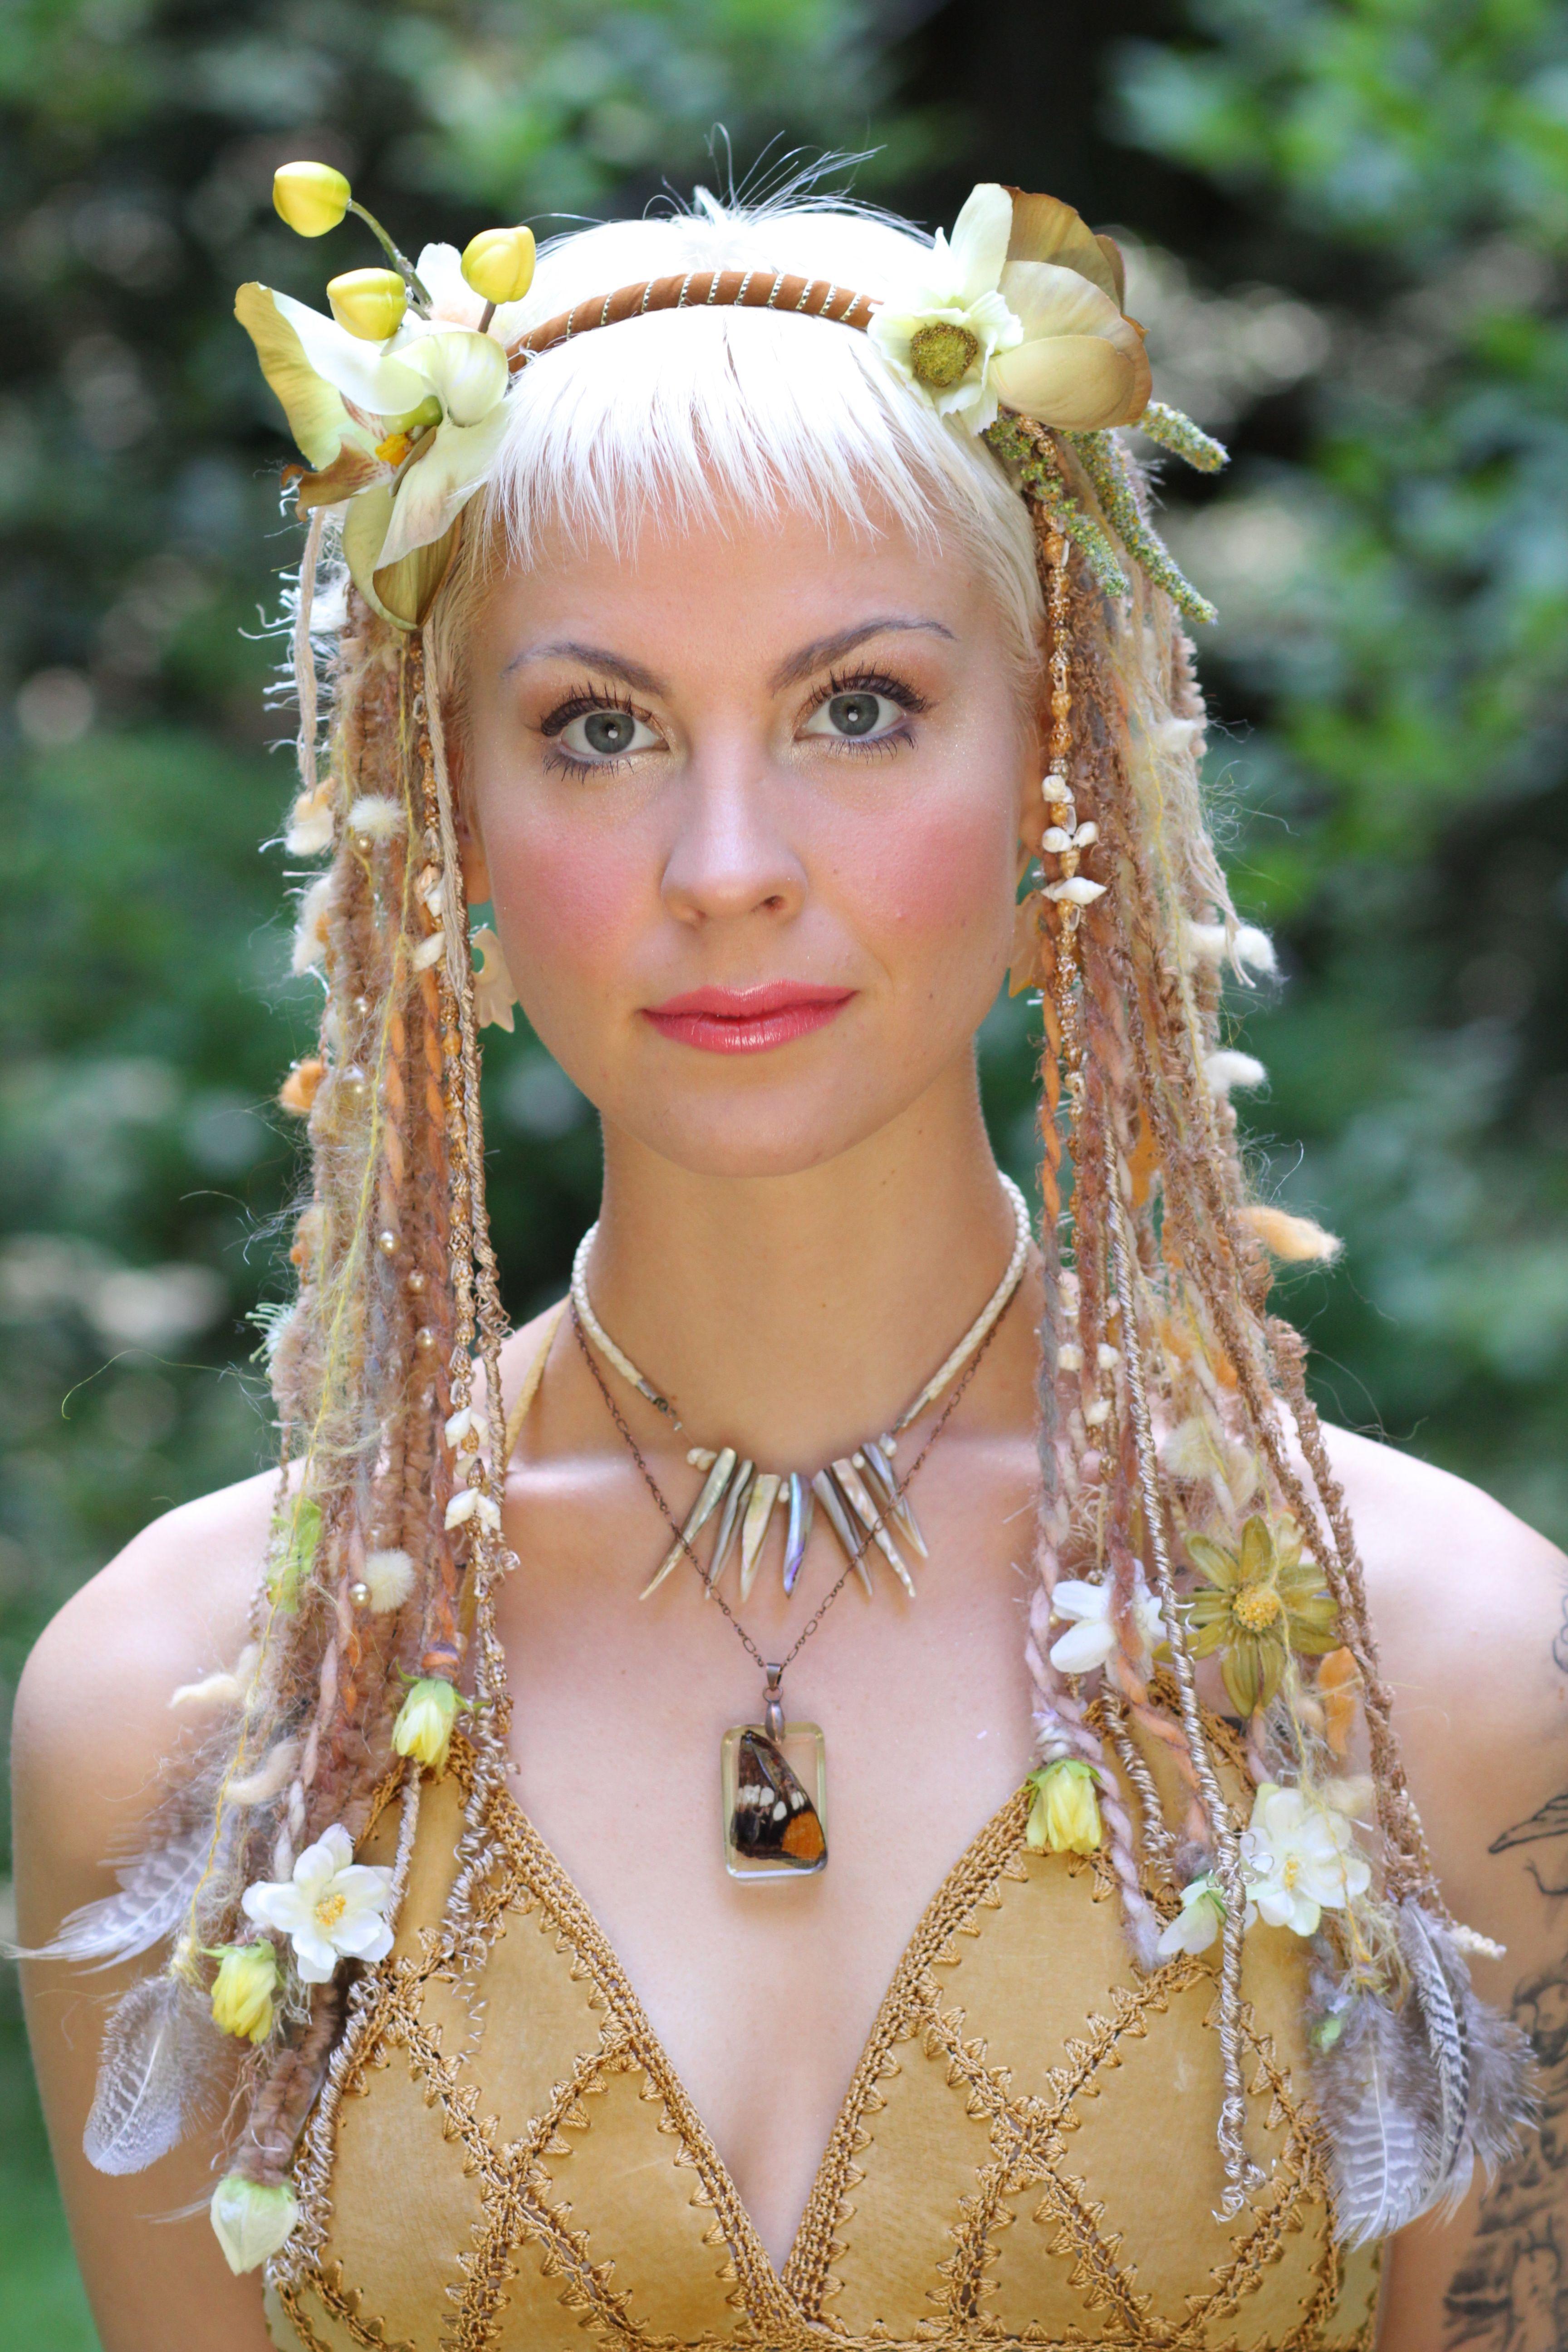 mother earth headdress dready wig goddess earthy faery woodland burningman flower headdress festival wear www.etsy.com/shop/lotuscircle